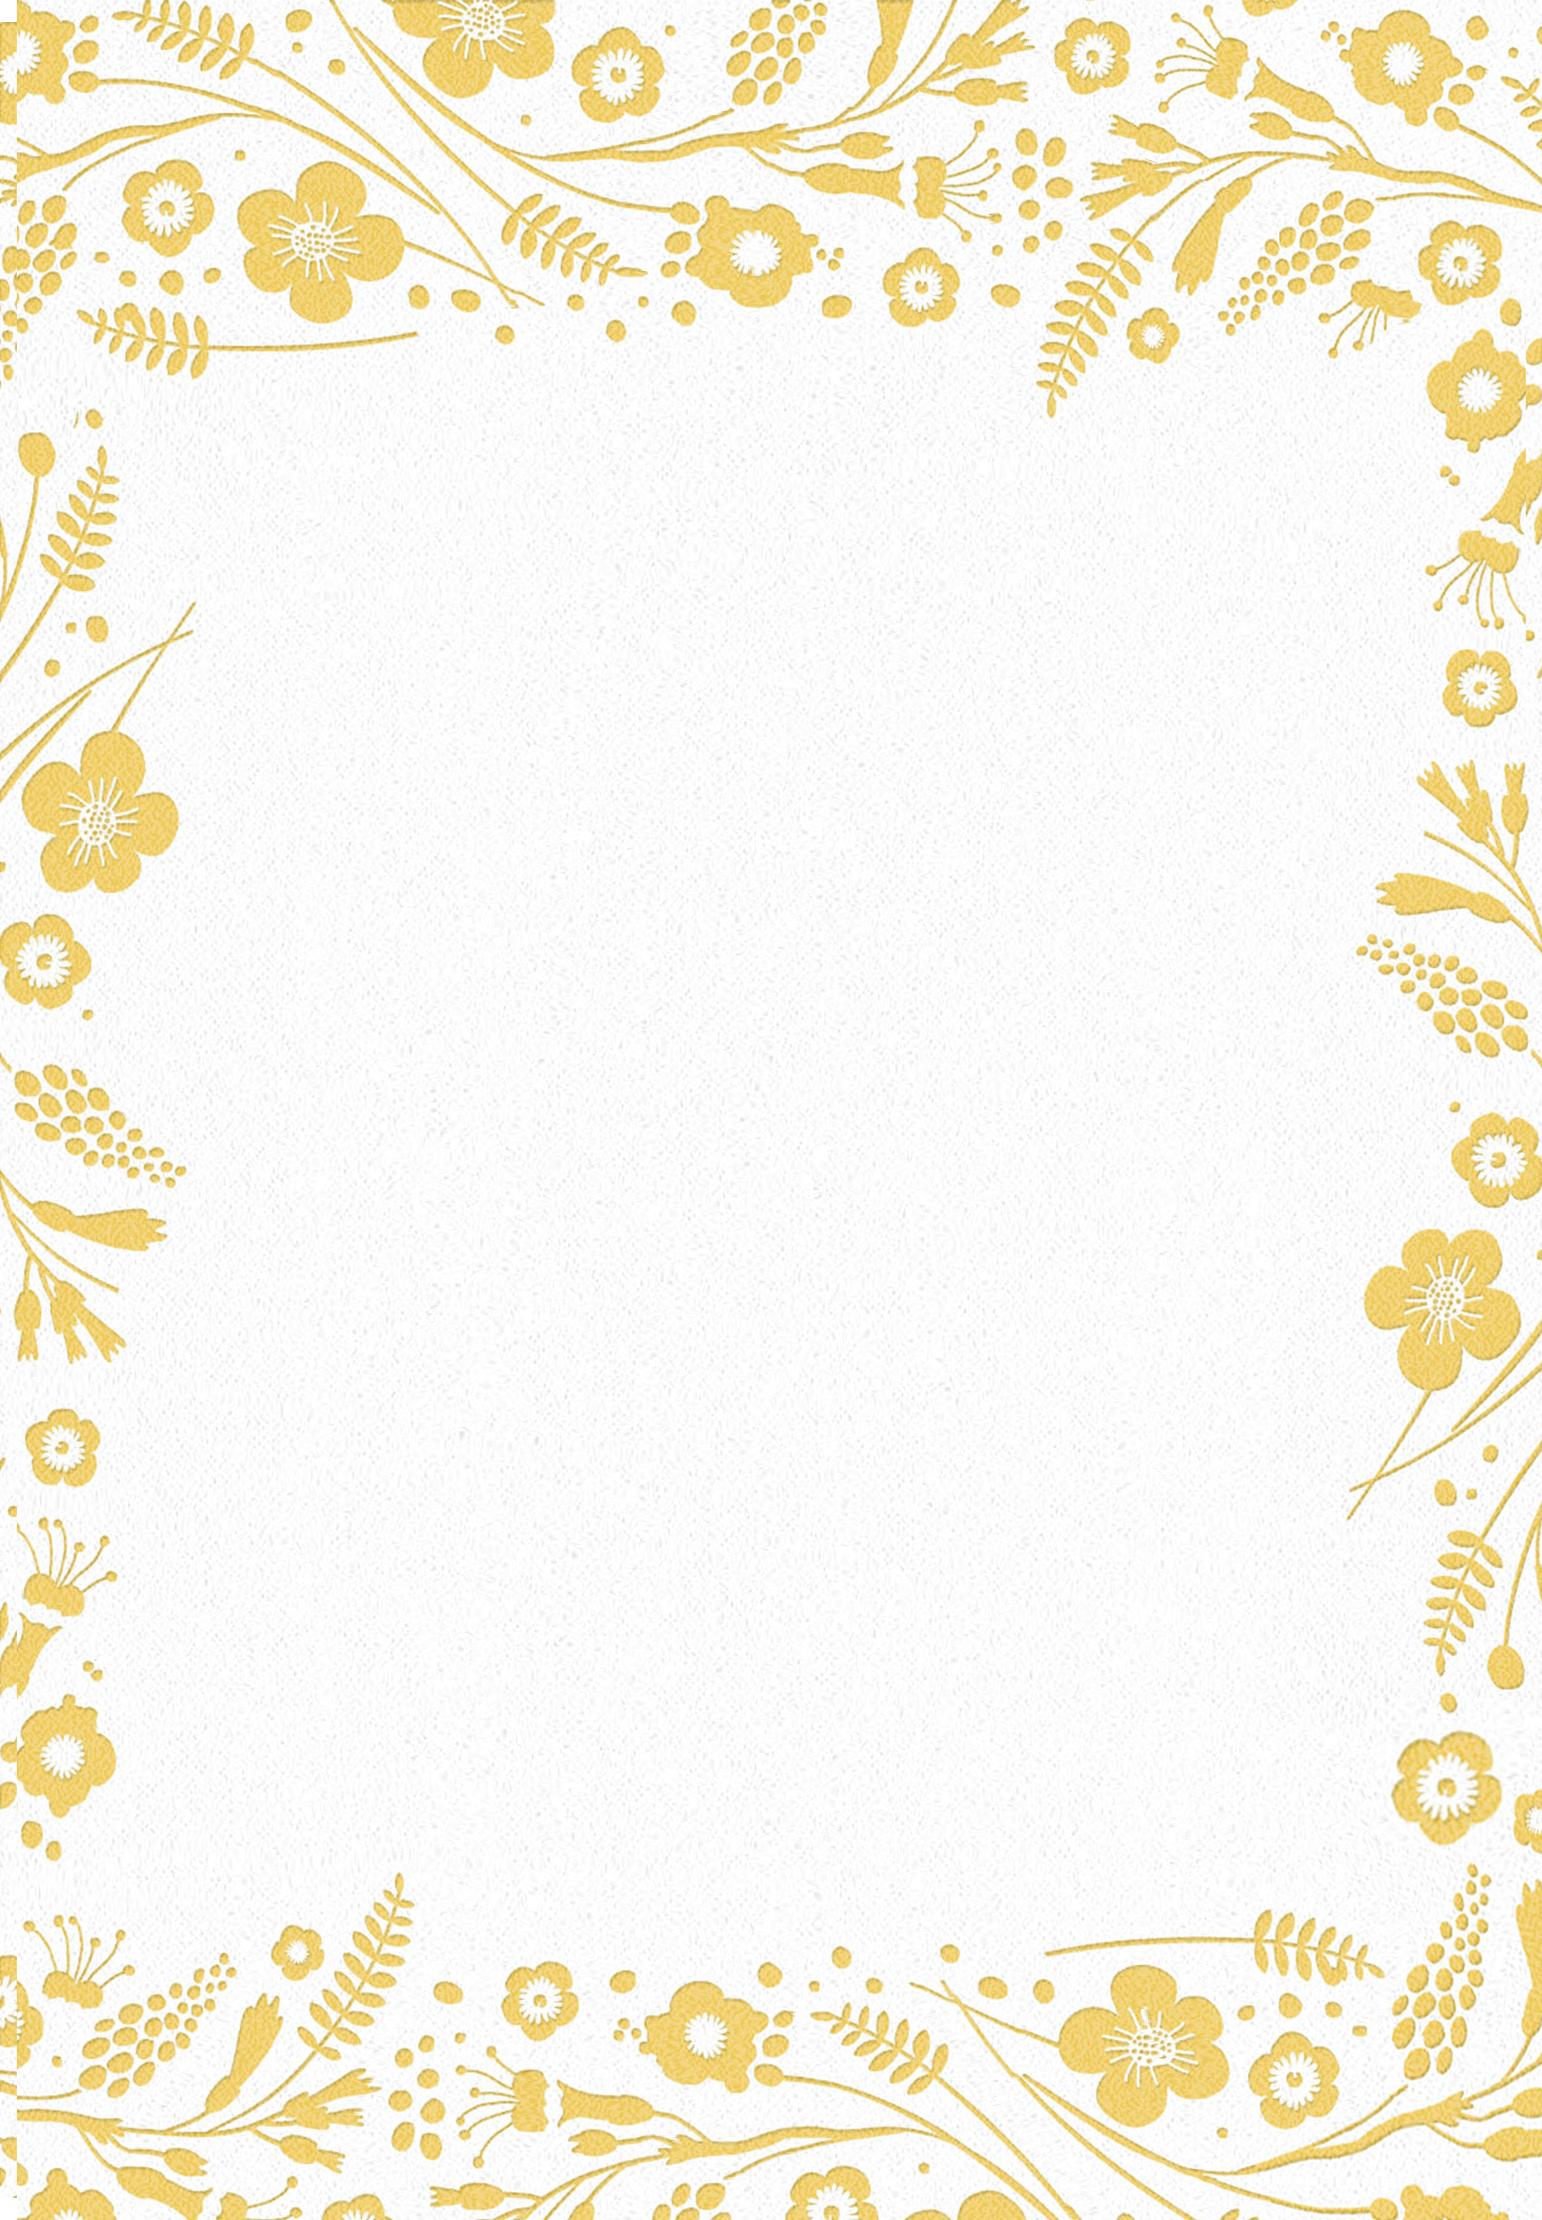 Pin by on border pinterest wildflowers wildflower borders free birthday invitation template greetings island filmwisefo